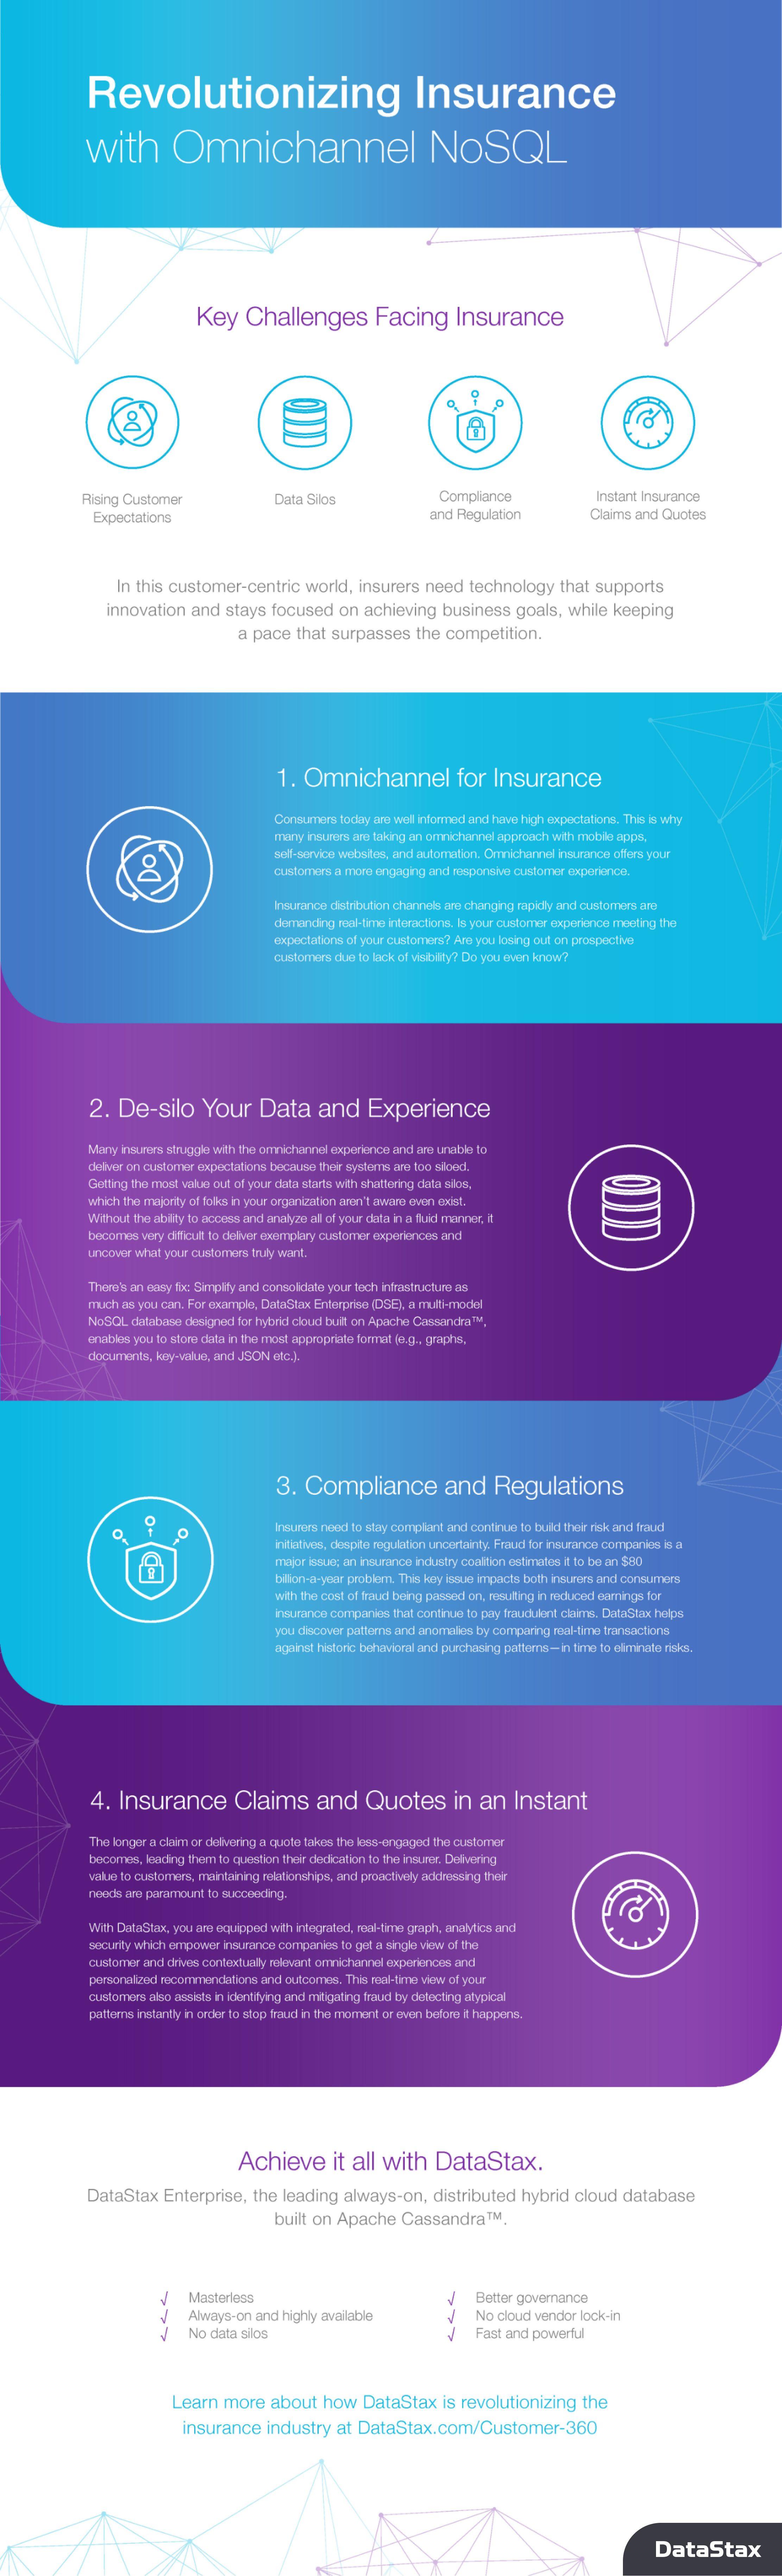 Revolutionizing Insurance with Omnichannel NoSQL